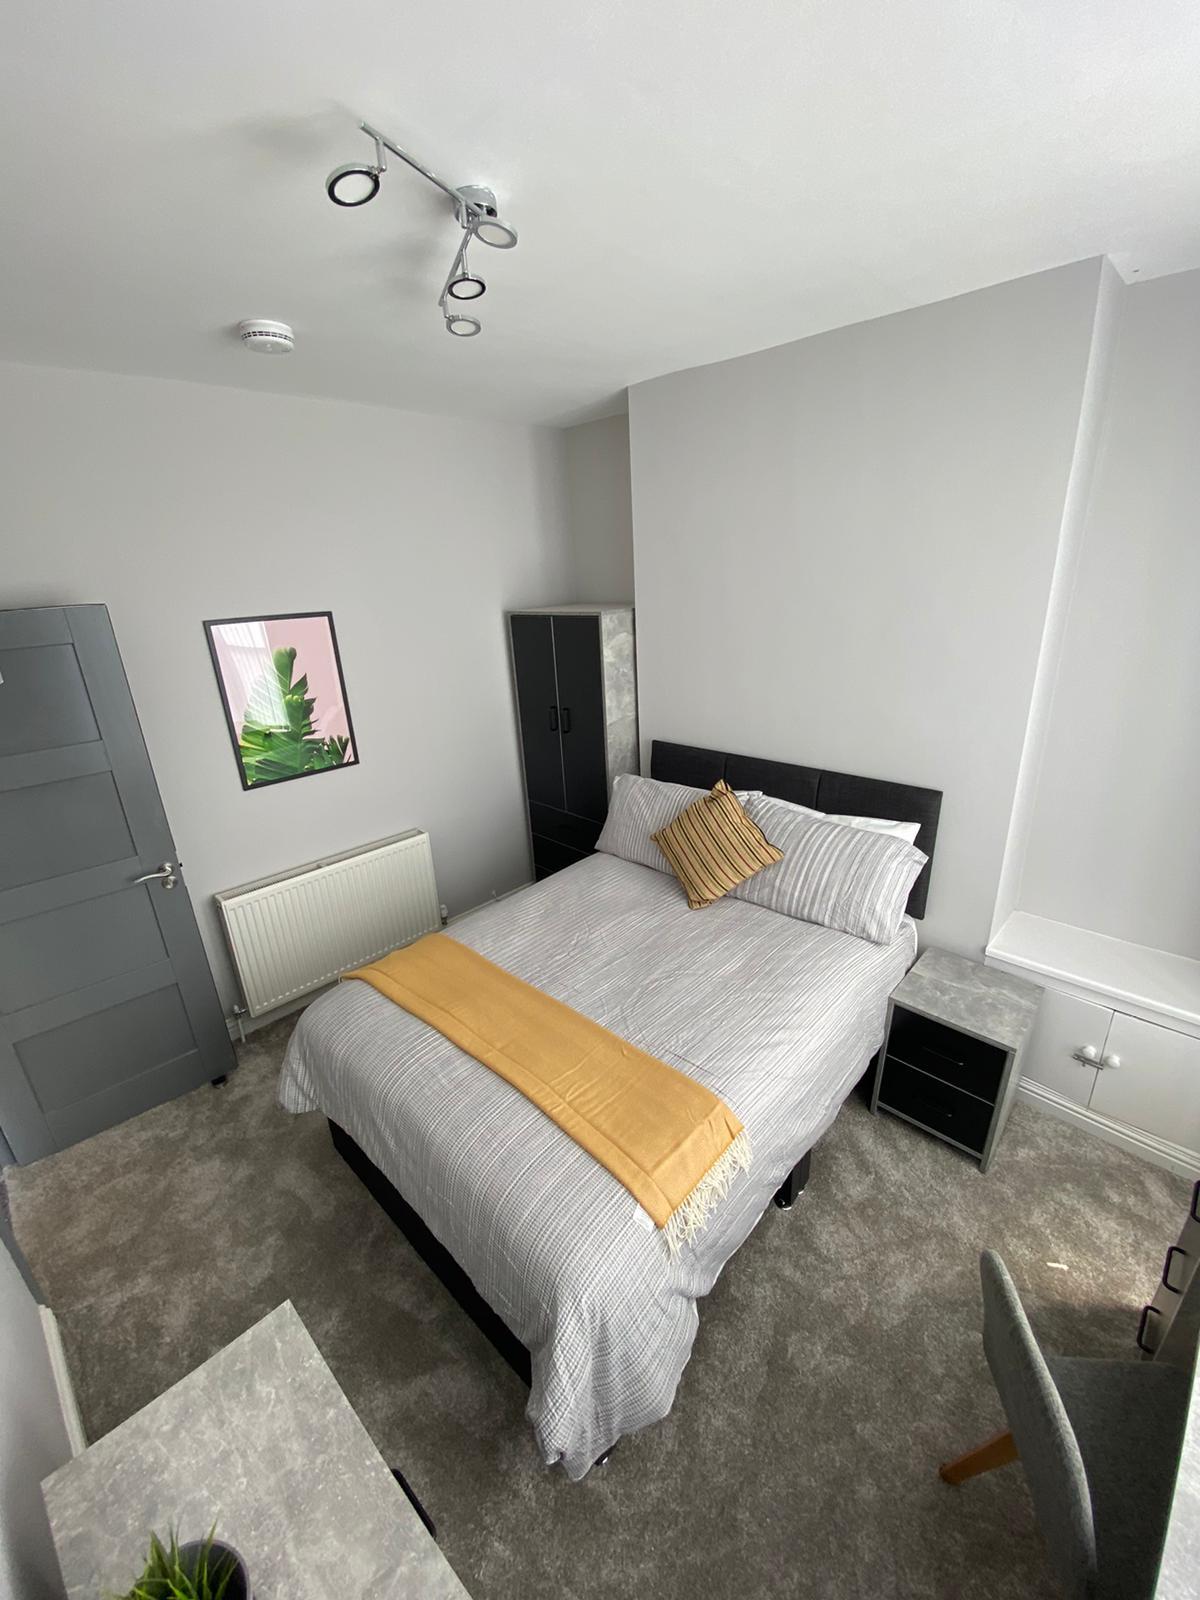 Student Accommodation Bedroom